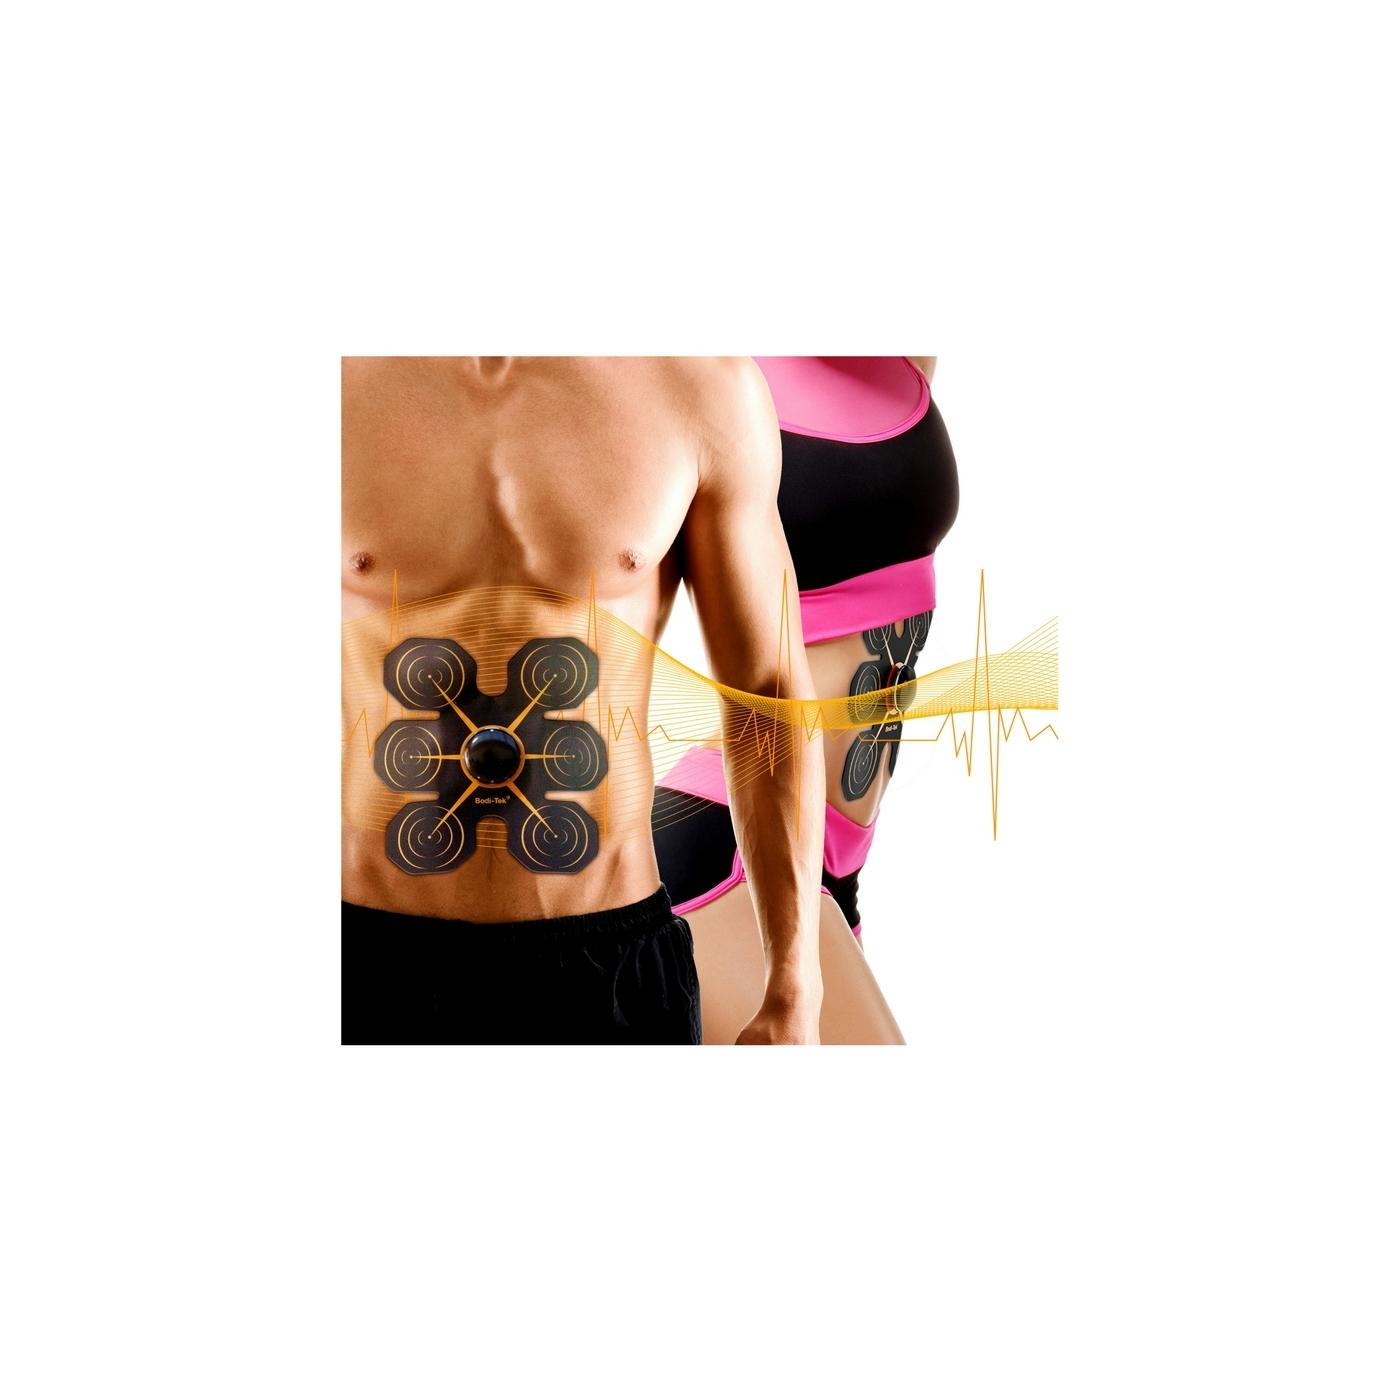 Eκγύμναση κοιλιακών Ab Core Trainer